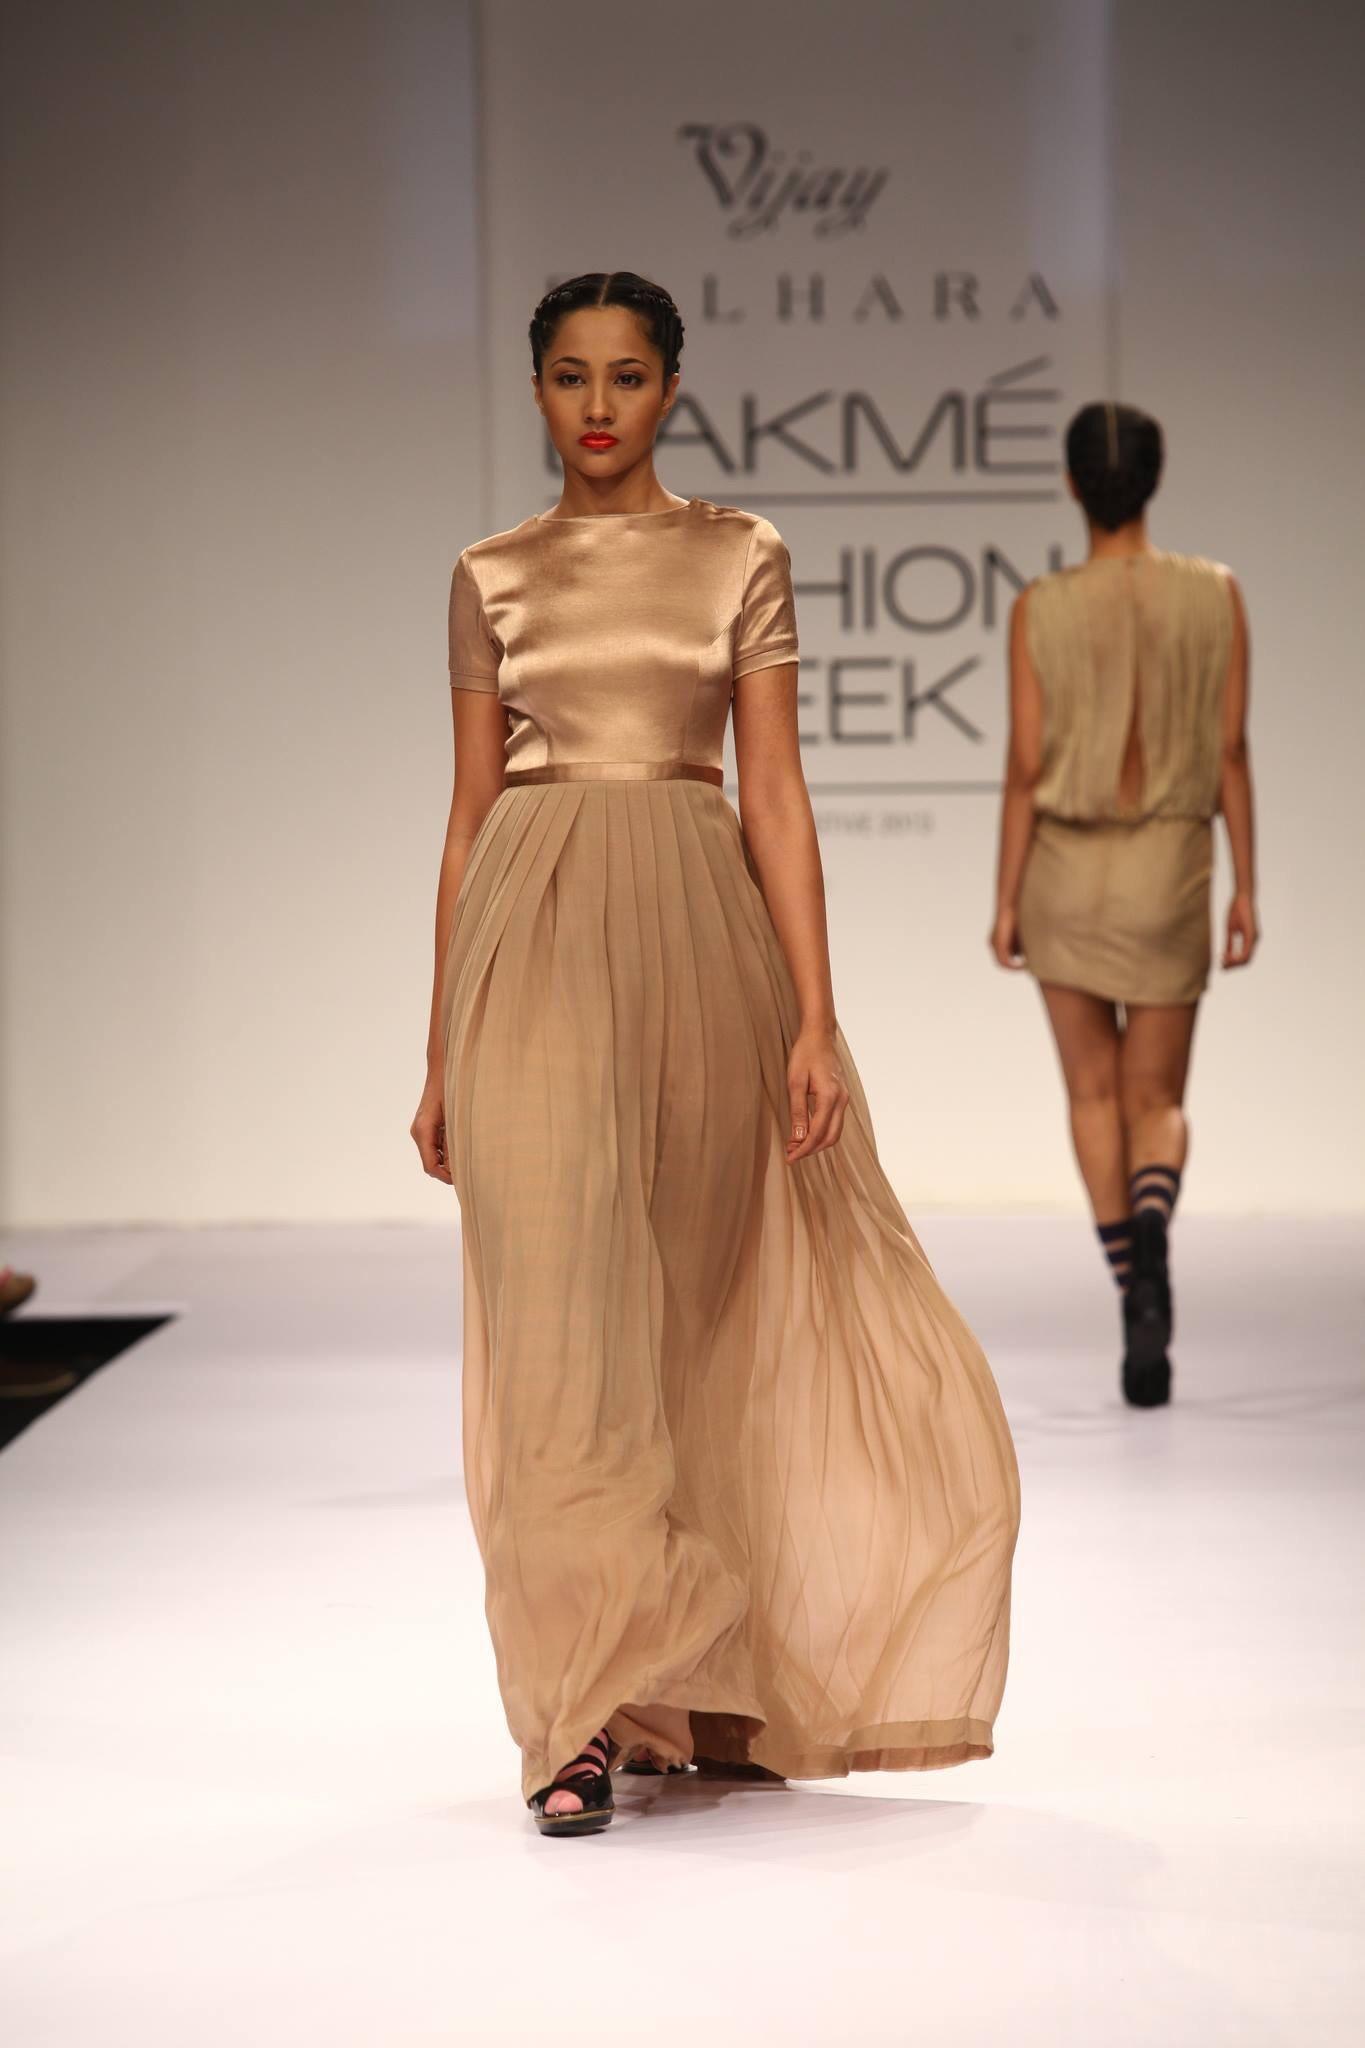 Roposo - Fashion & Lifestyle Inspirations - Magazine cover